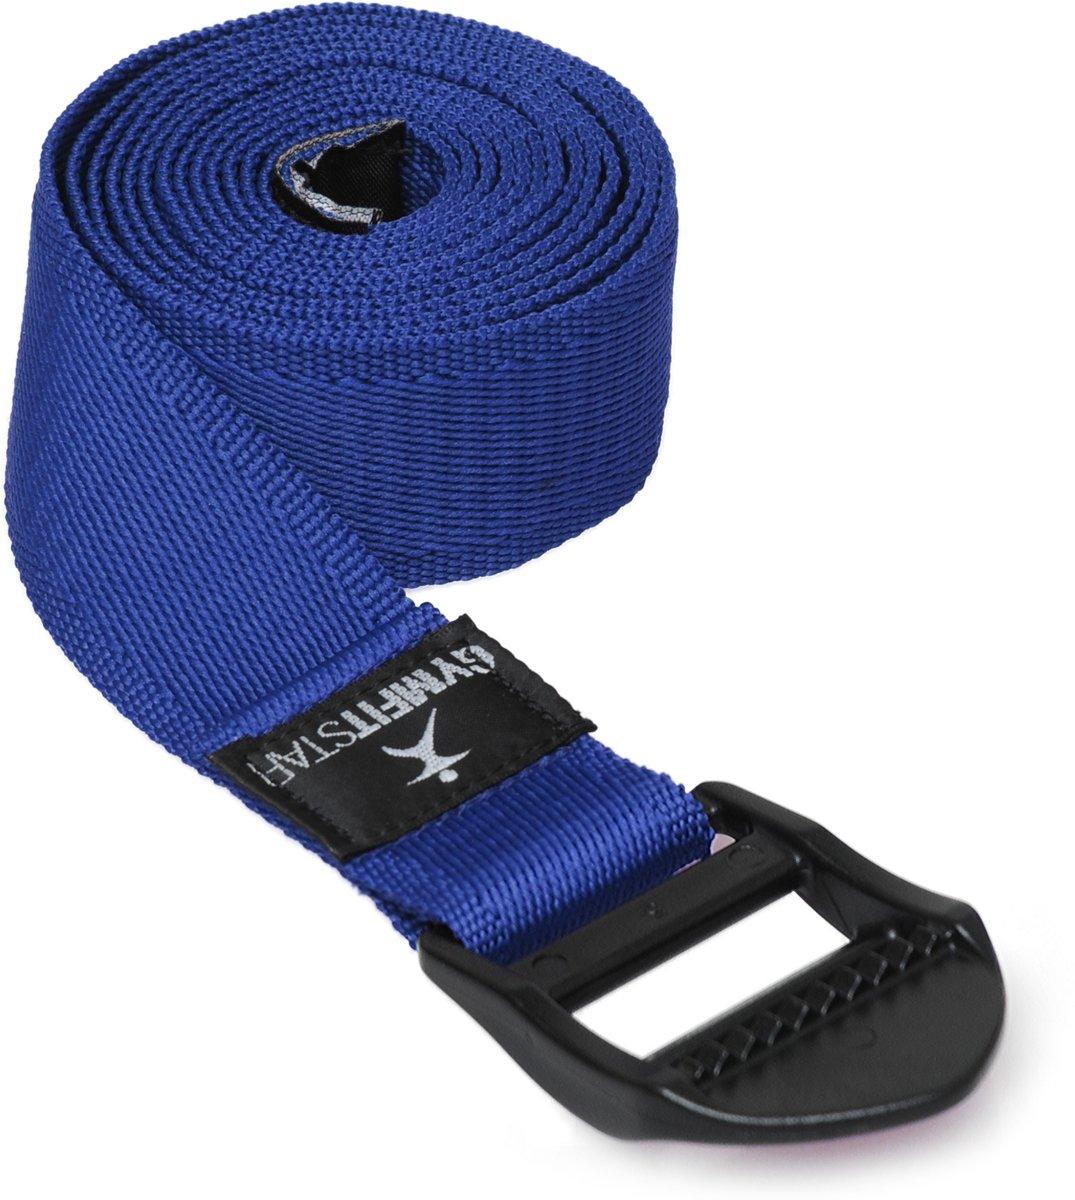 Yoga riem voor Yoga, Pilates & Fitness - PB 210cm blue Yoga riem YOGISTAR kopen